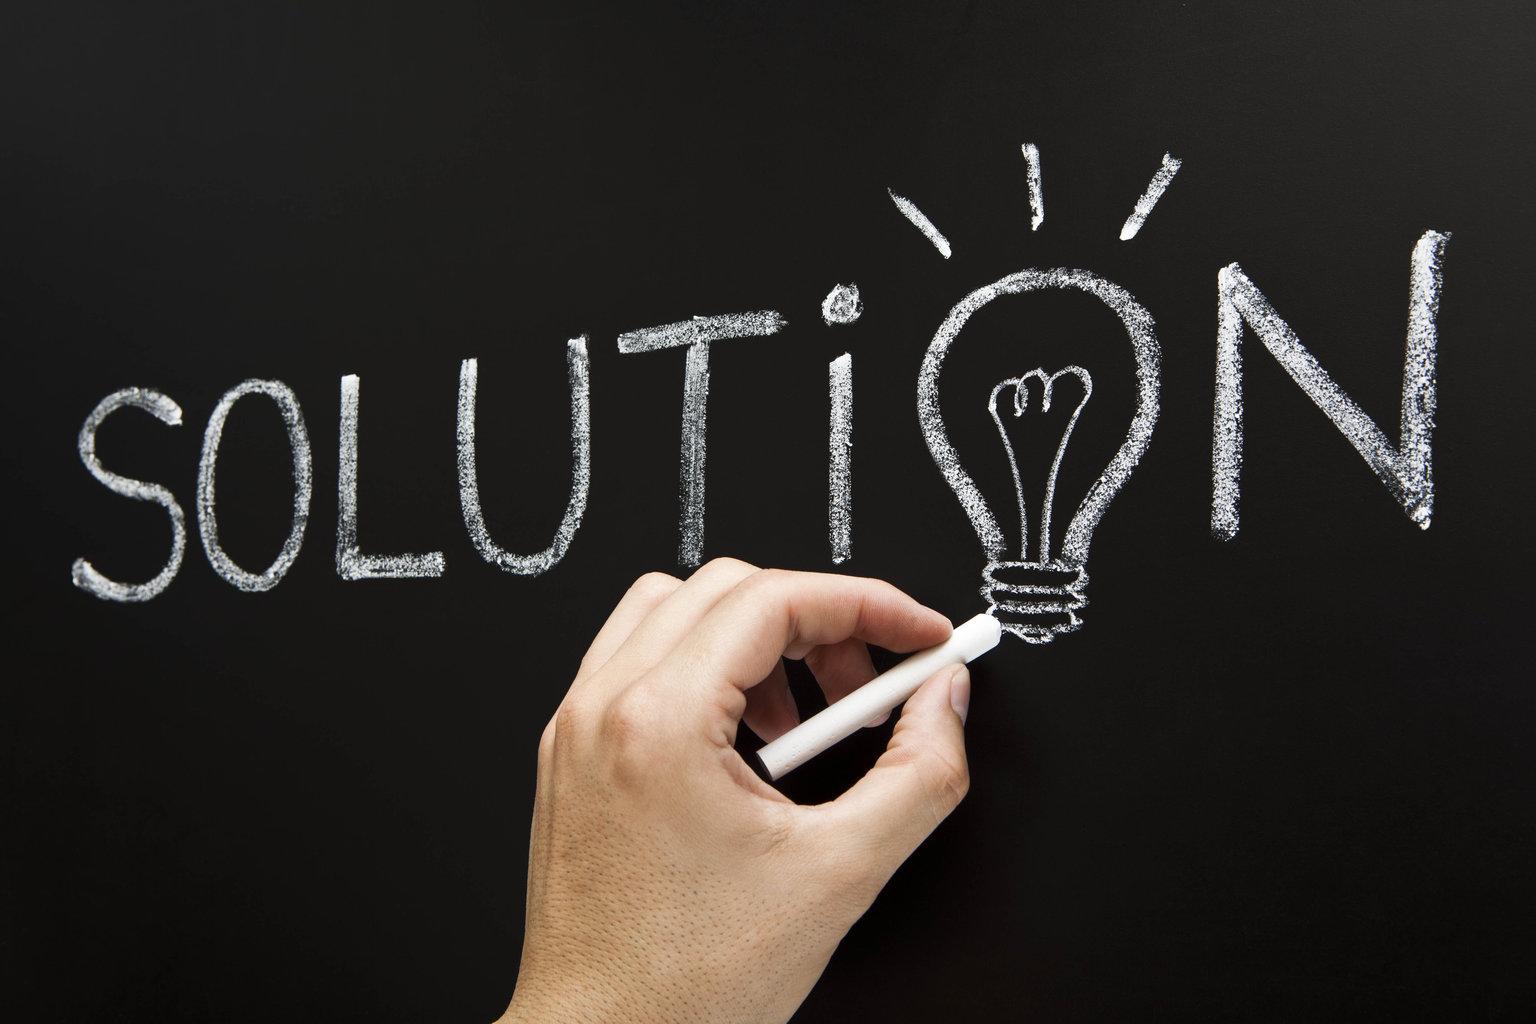 solution-chalkboard-concept